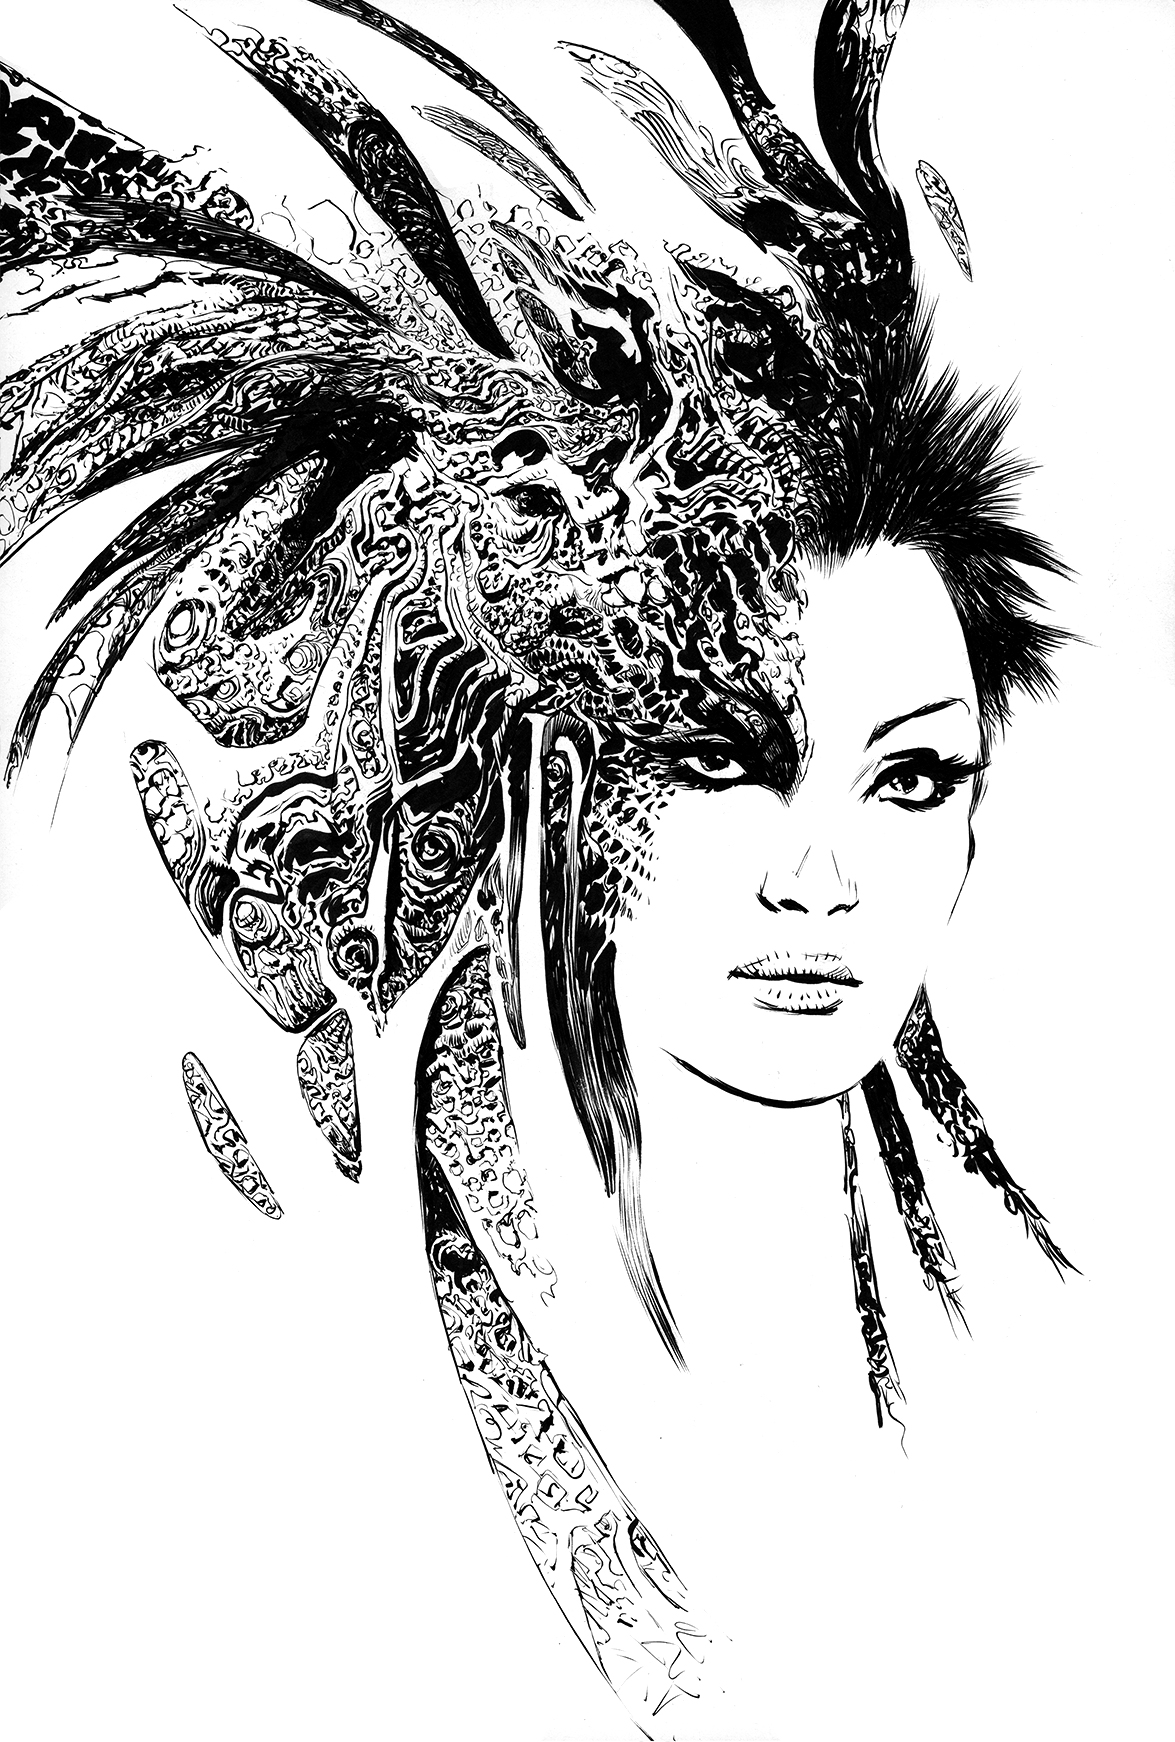 INK Sketch 02 by Nisachar